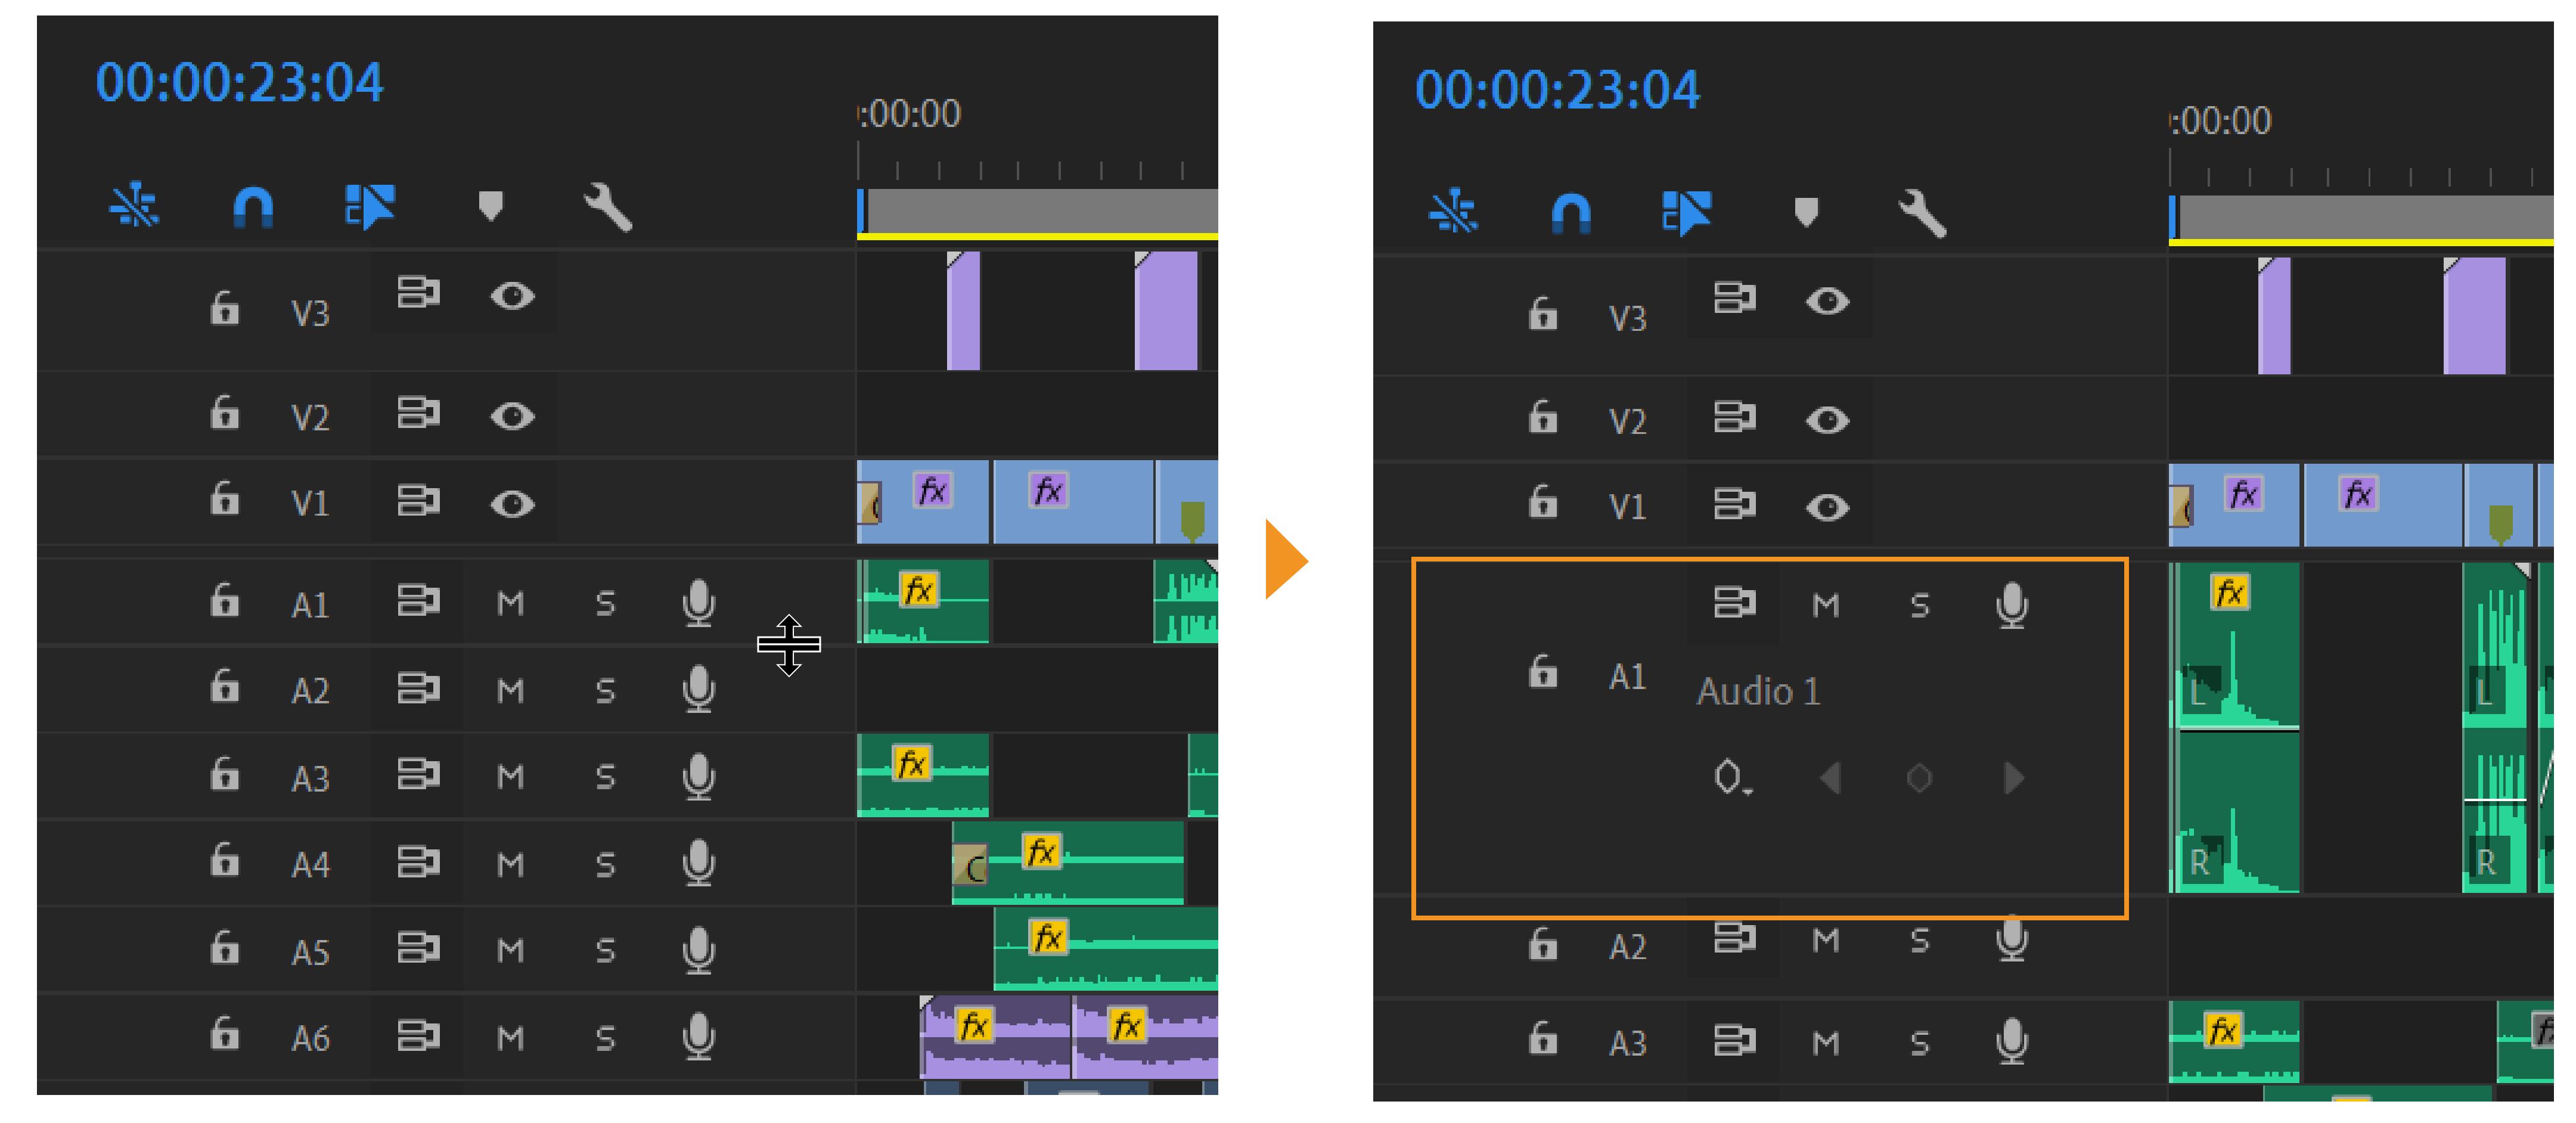 e0e679441b Creación y modificación de secuencias en Premiere Pro